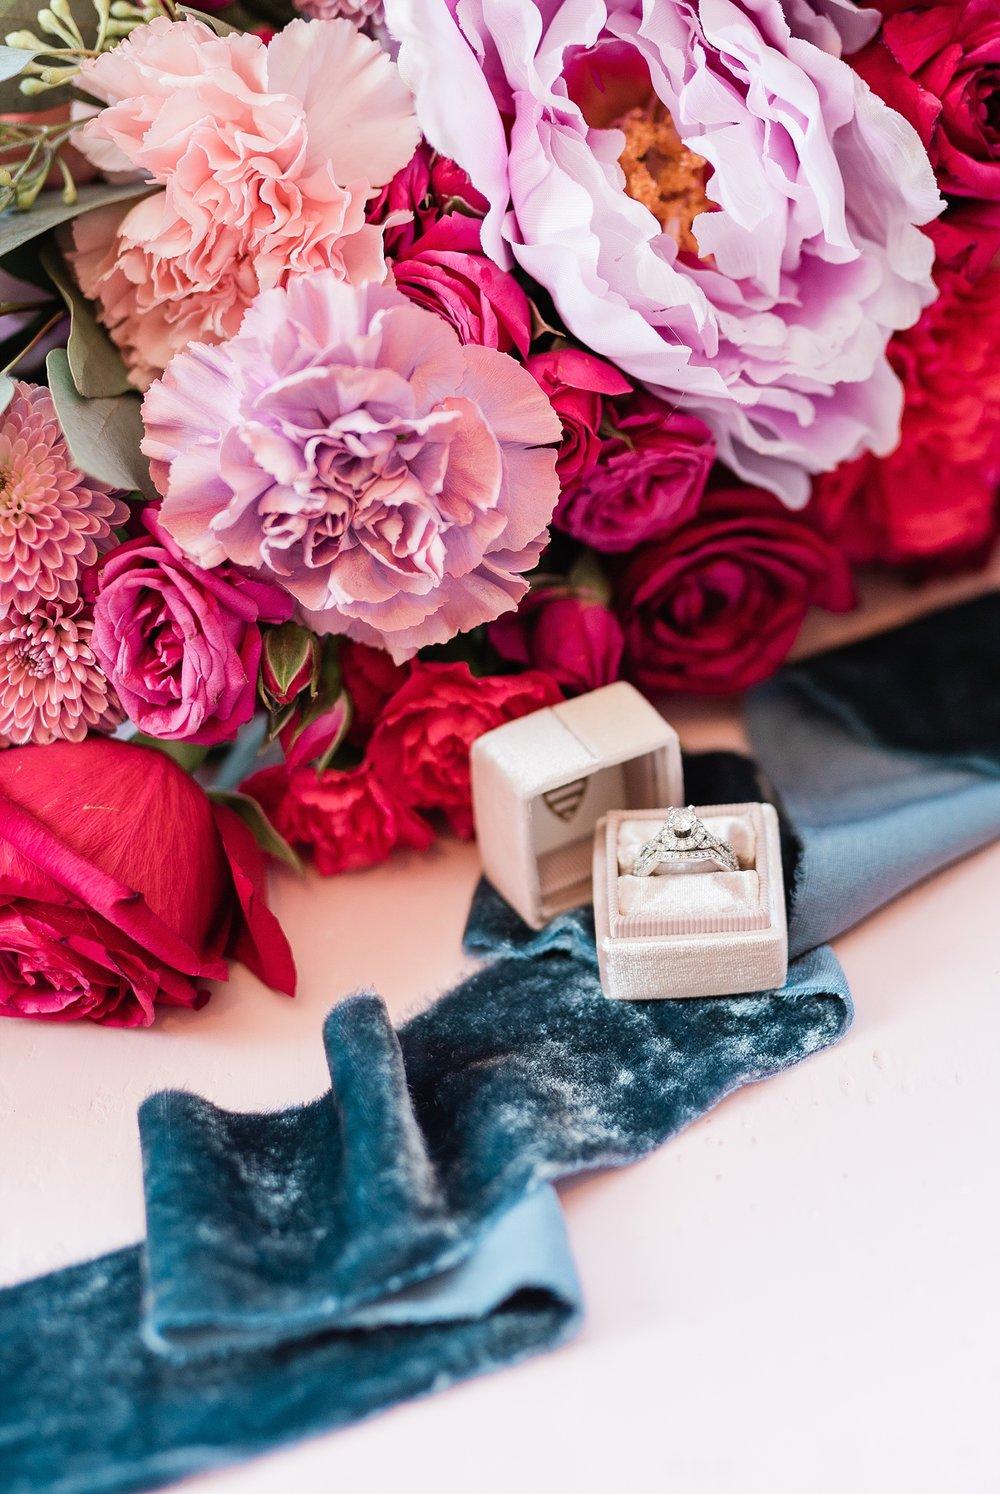 Alan and Heather Horn Wedding by Kelsi Kliethermes Photography Associate - Rachel_0037.jpg